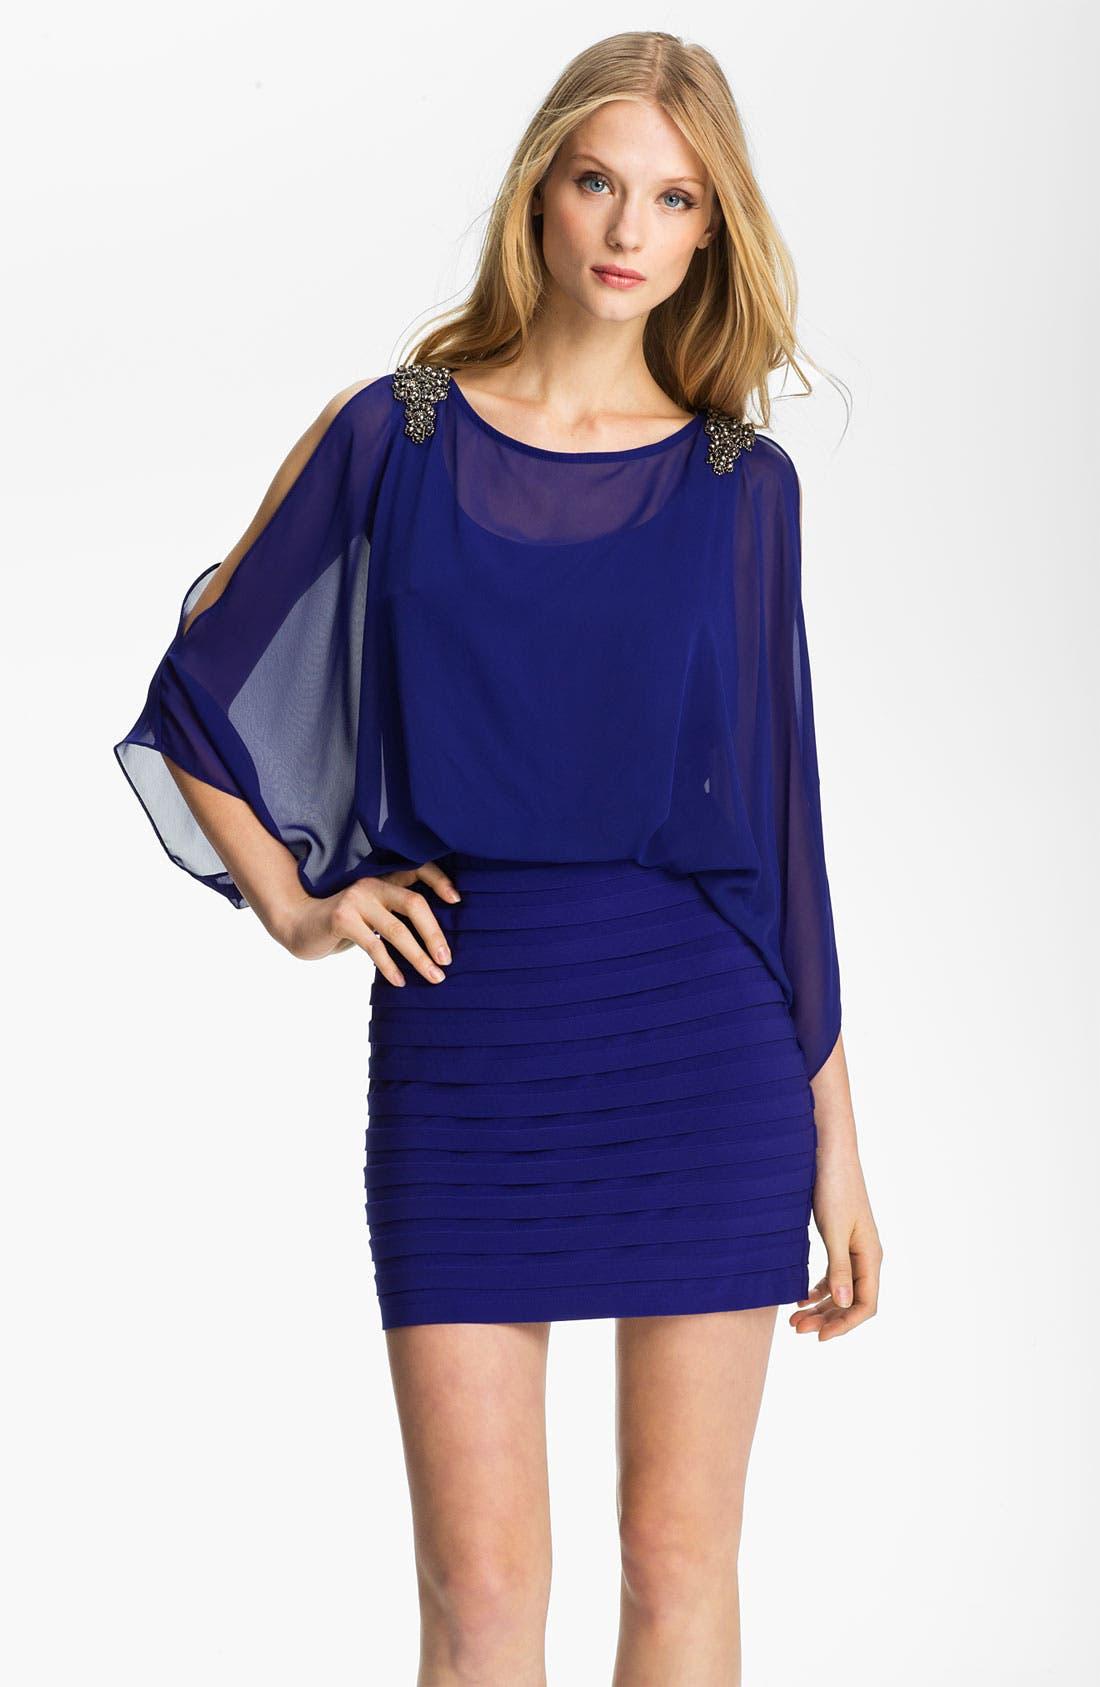 Main Image - Xscape Embellished Shoulder Chiffon & Jersey Blouson Dress